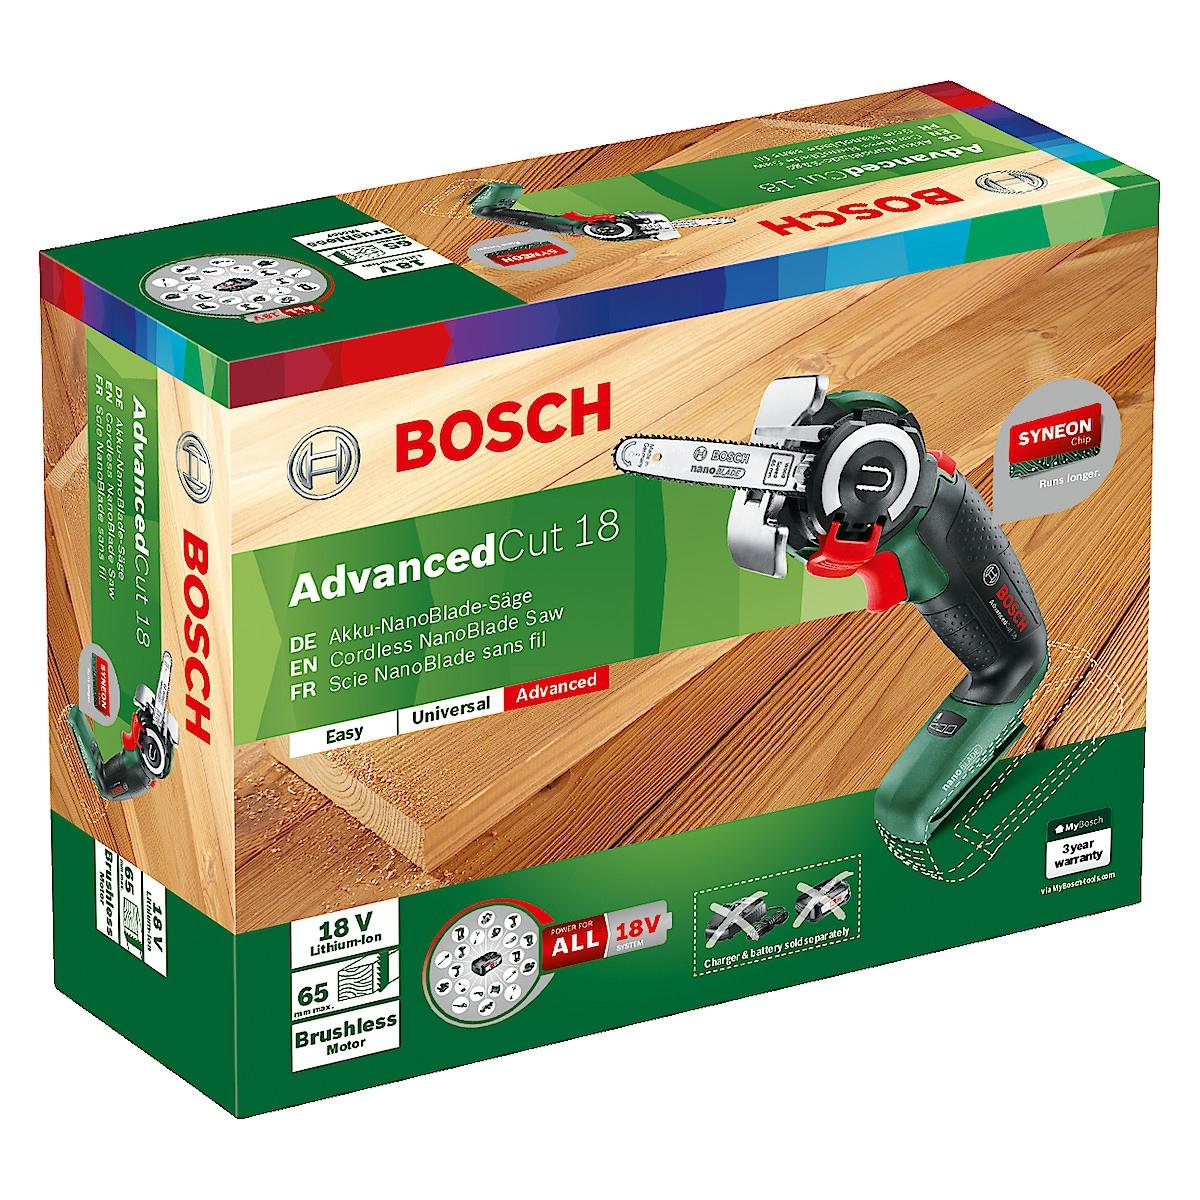 Bosch AdvancedCut 18 multisag